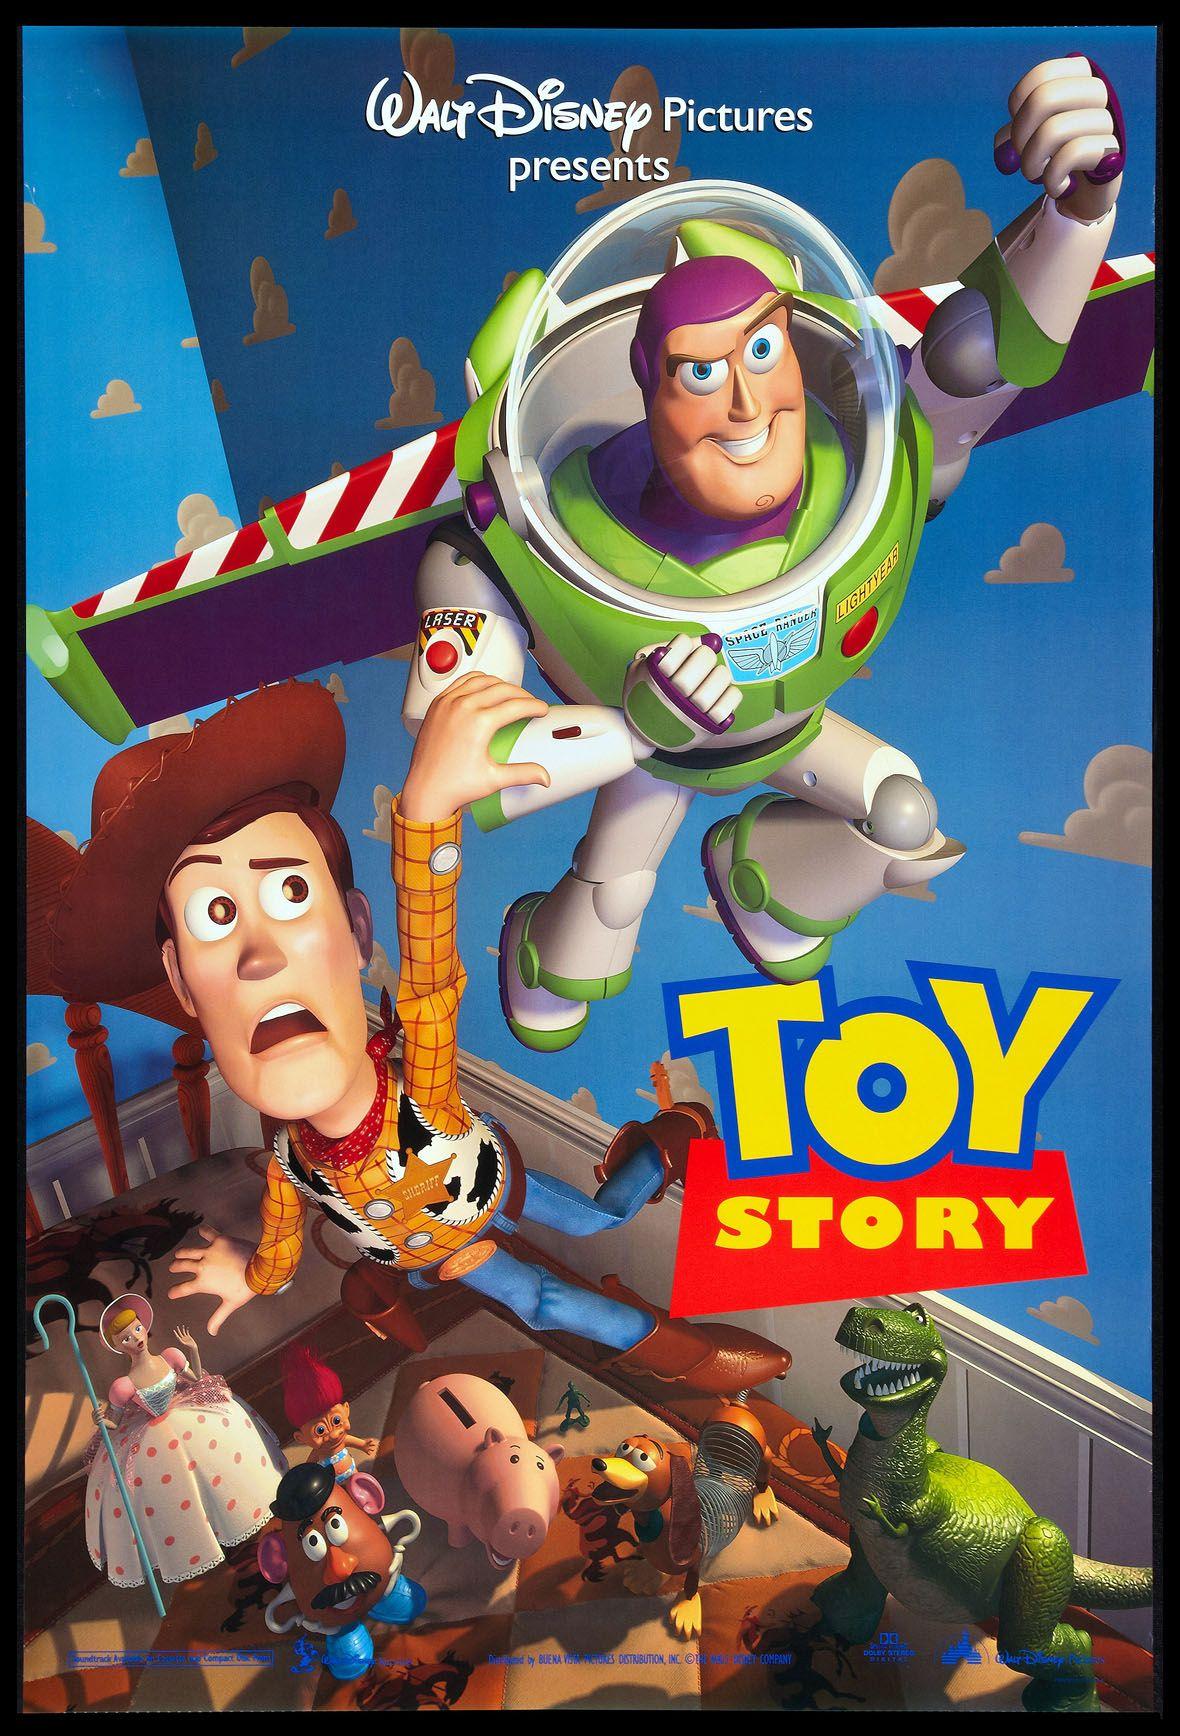 Toy Story 1995 Original One Sheet Size 27x40 Movie Poster Toy Story Movie Disney Movie Posters Toy Story 1995